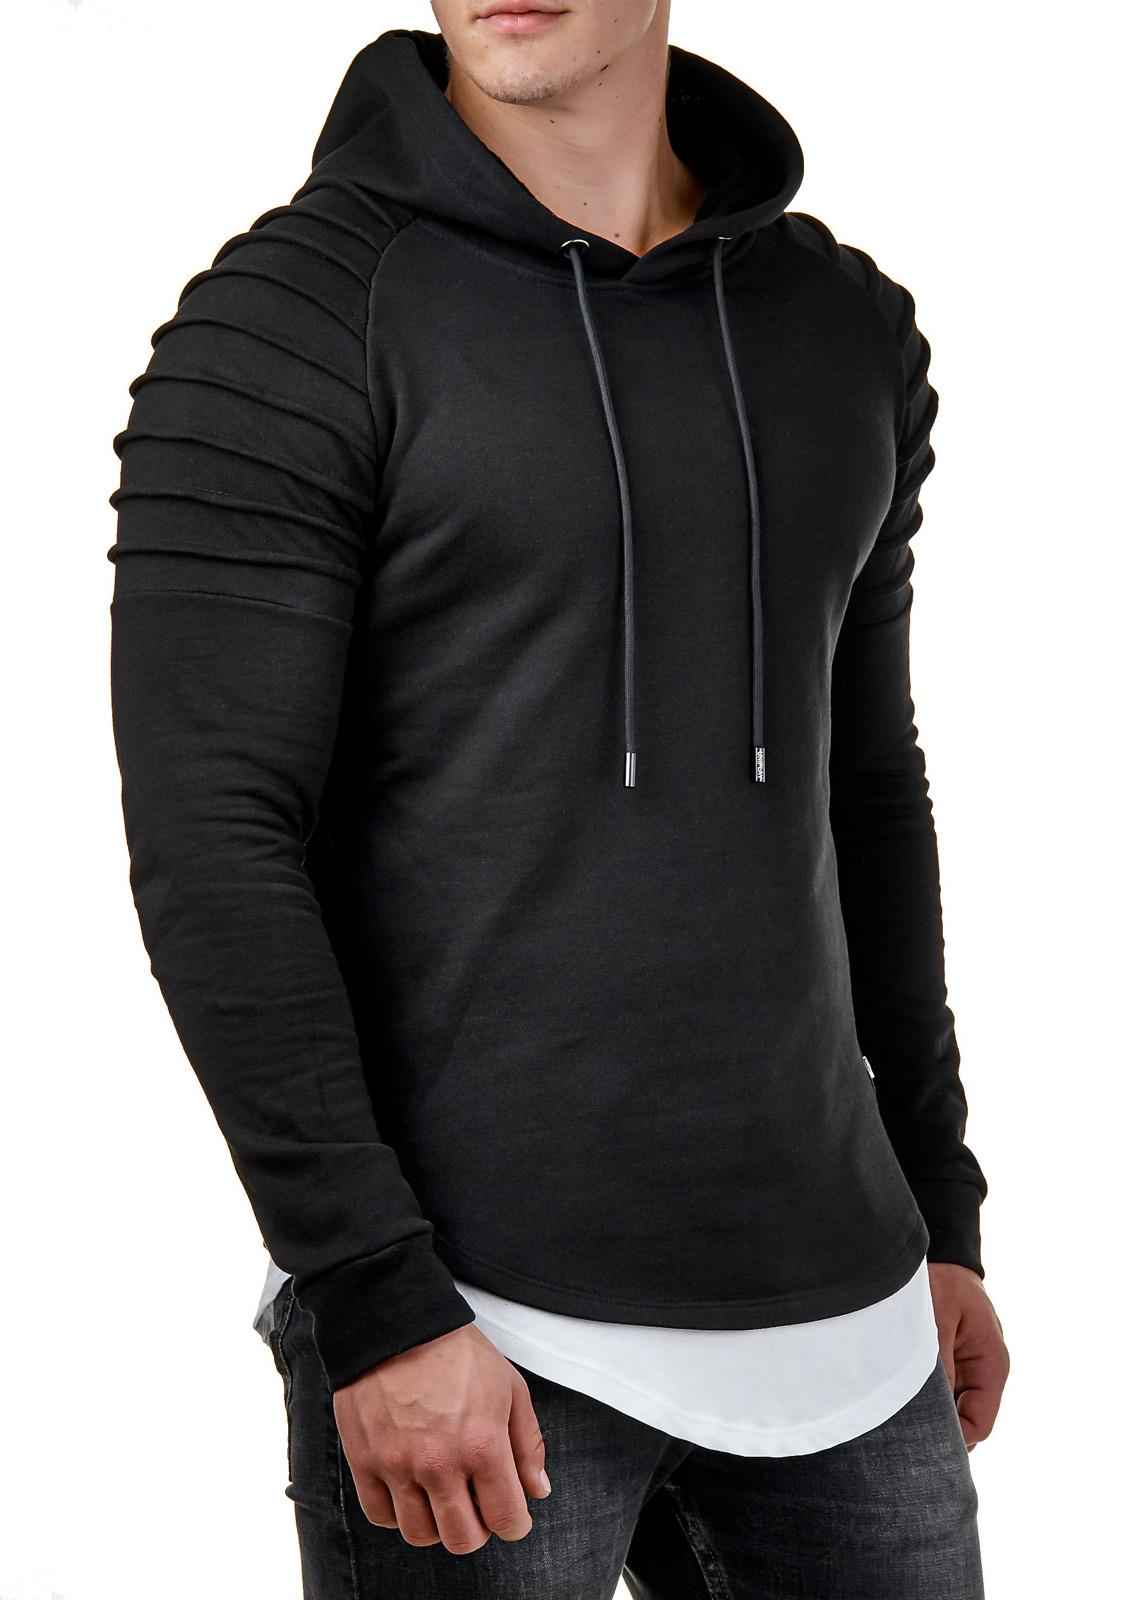 EFY71 Hoodie Clothing Pullover Hoodies   EightyFive 3a16fc80bb